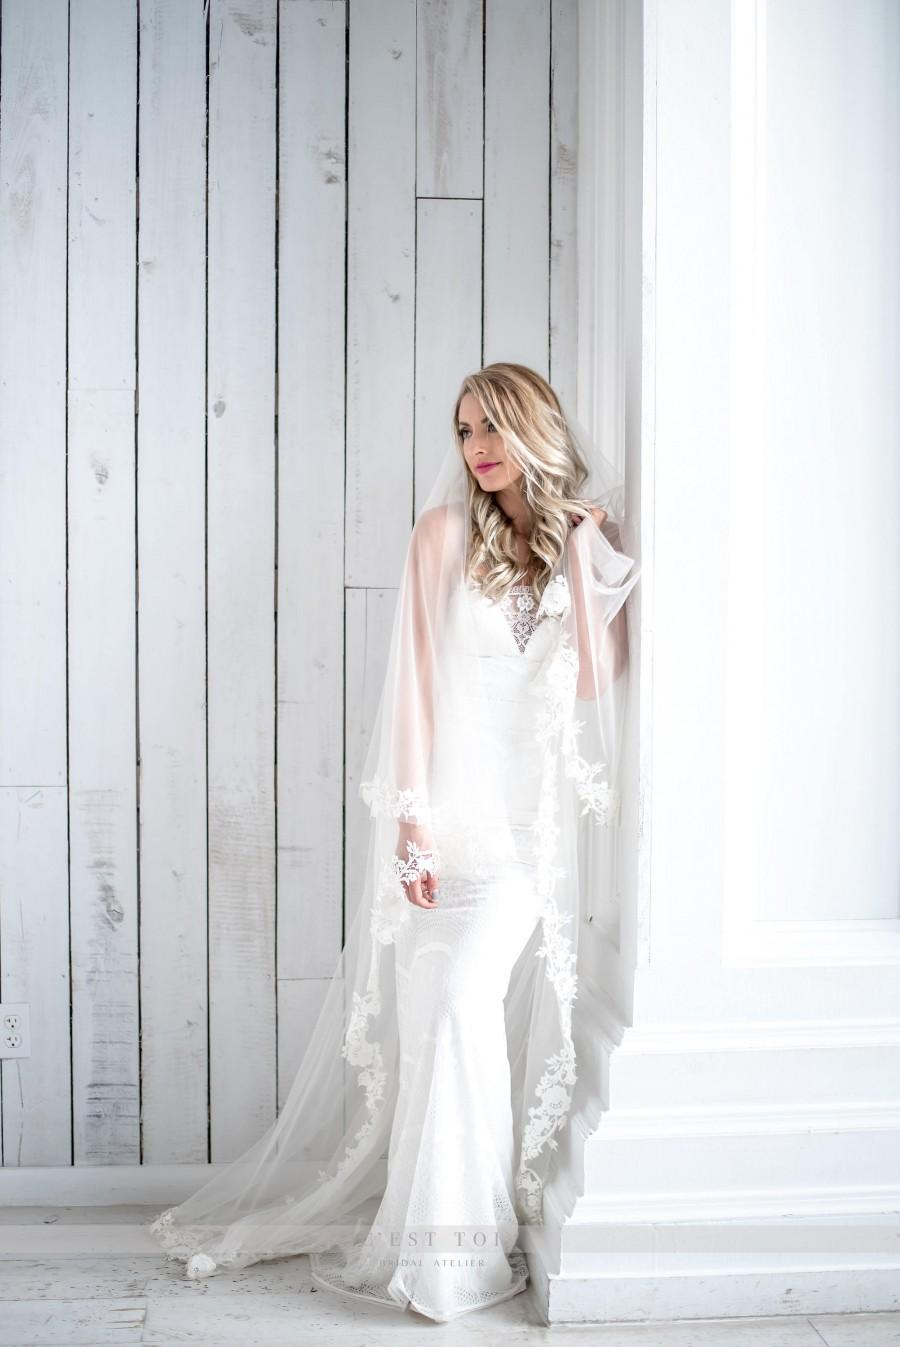 Свадьба - V01, Drop Lace Veil, Drop Lace Bridal Veil, Drop Veil, Bridal Veil, Lace Veil, Wedding Veil, Wedding Lace Veils, Cascading Veil